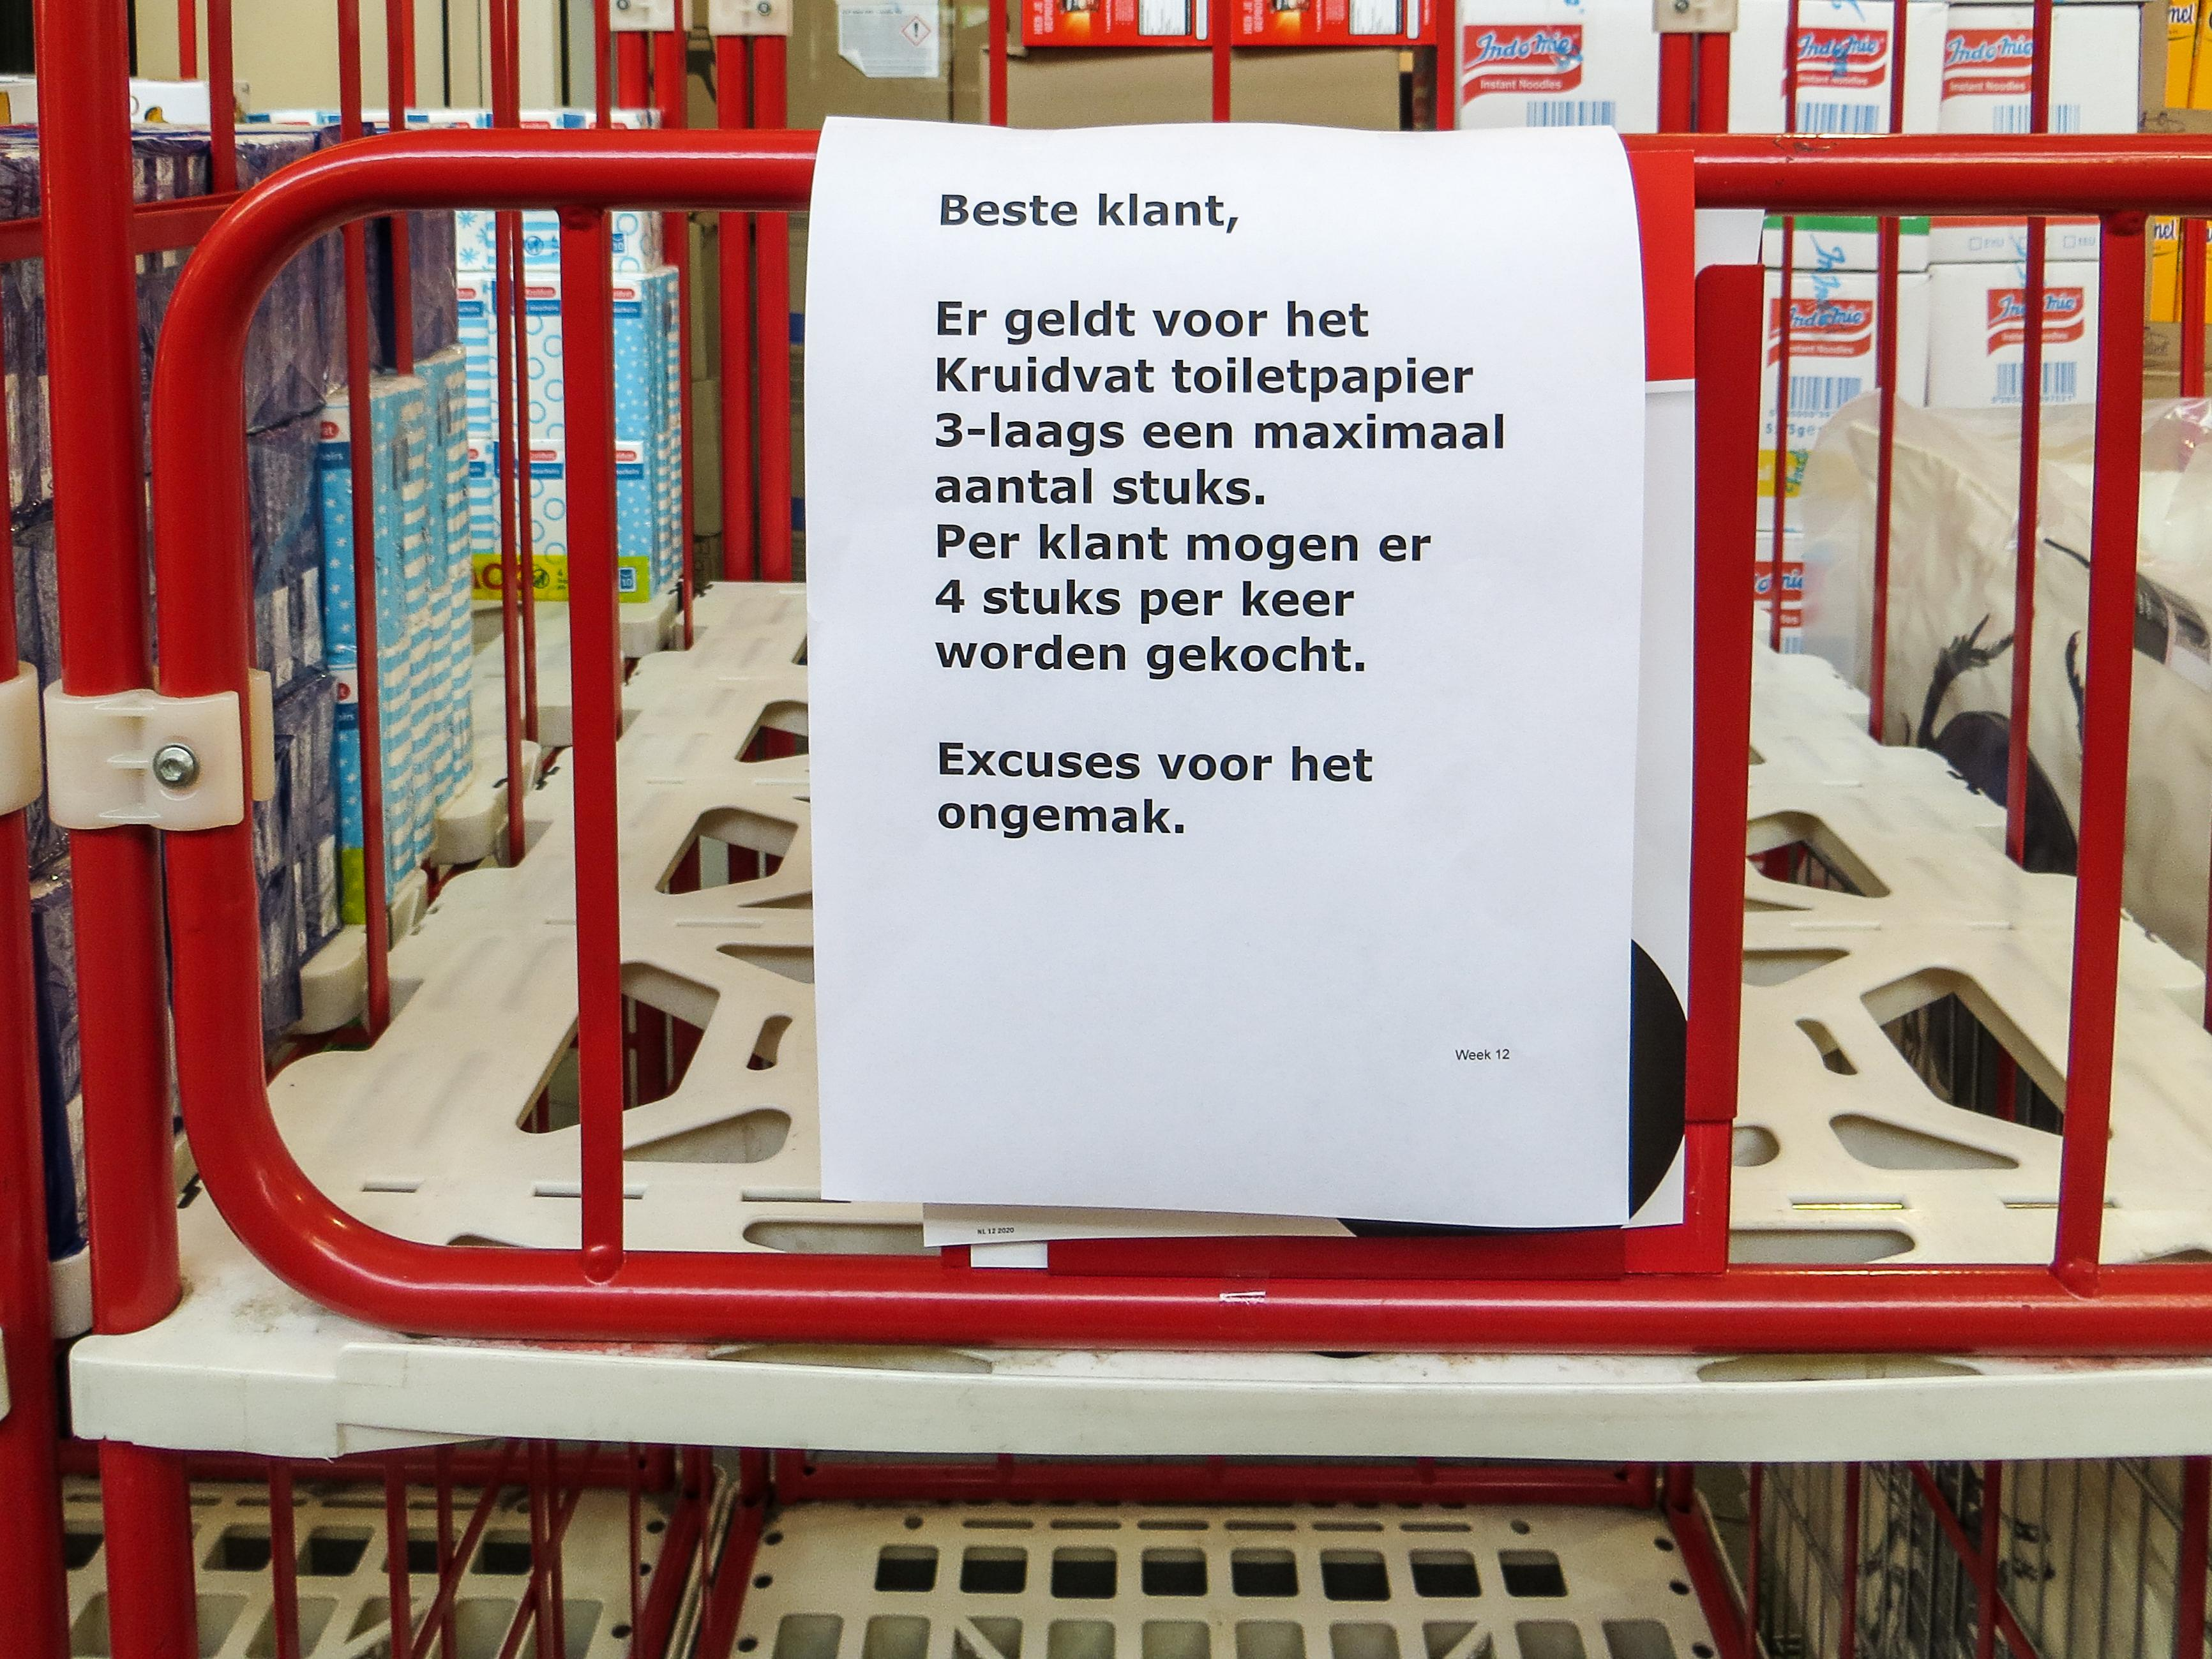 Kruidvat zet rem op verkoop wc-papier en zuigelingenvoeding